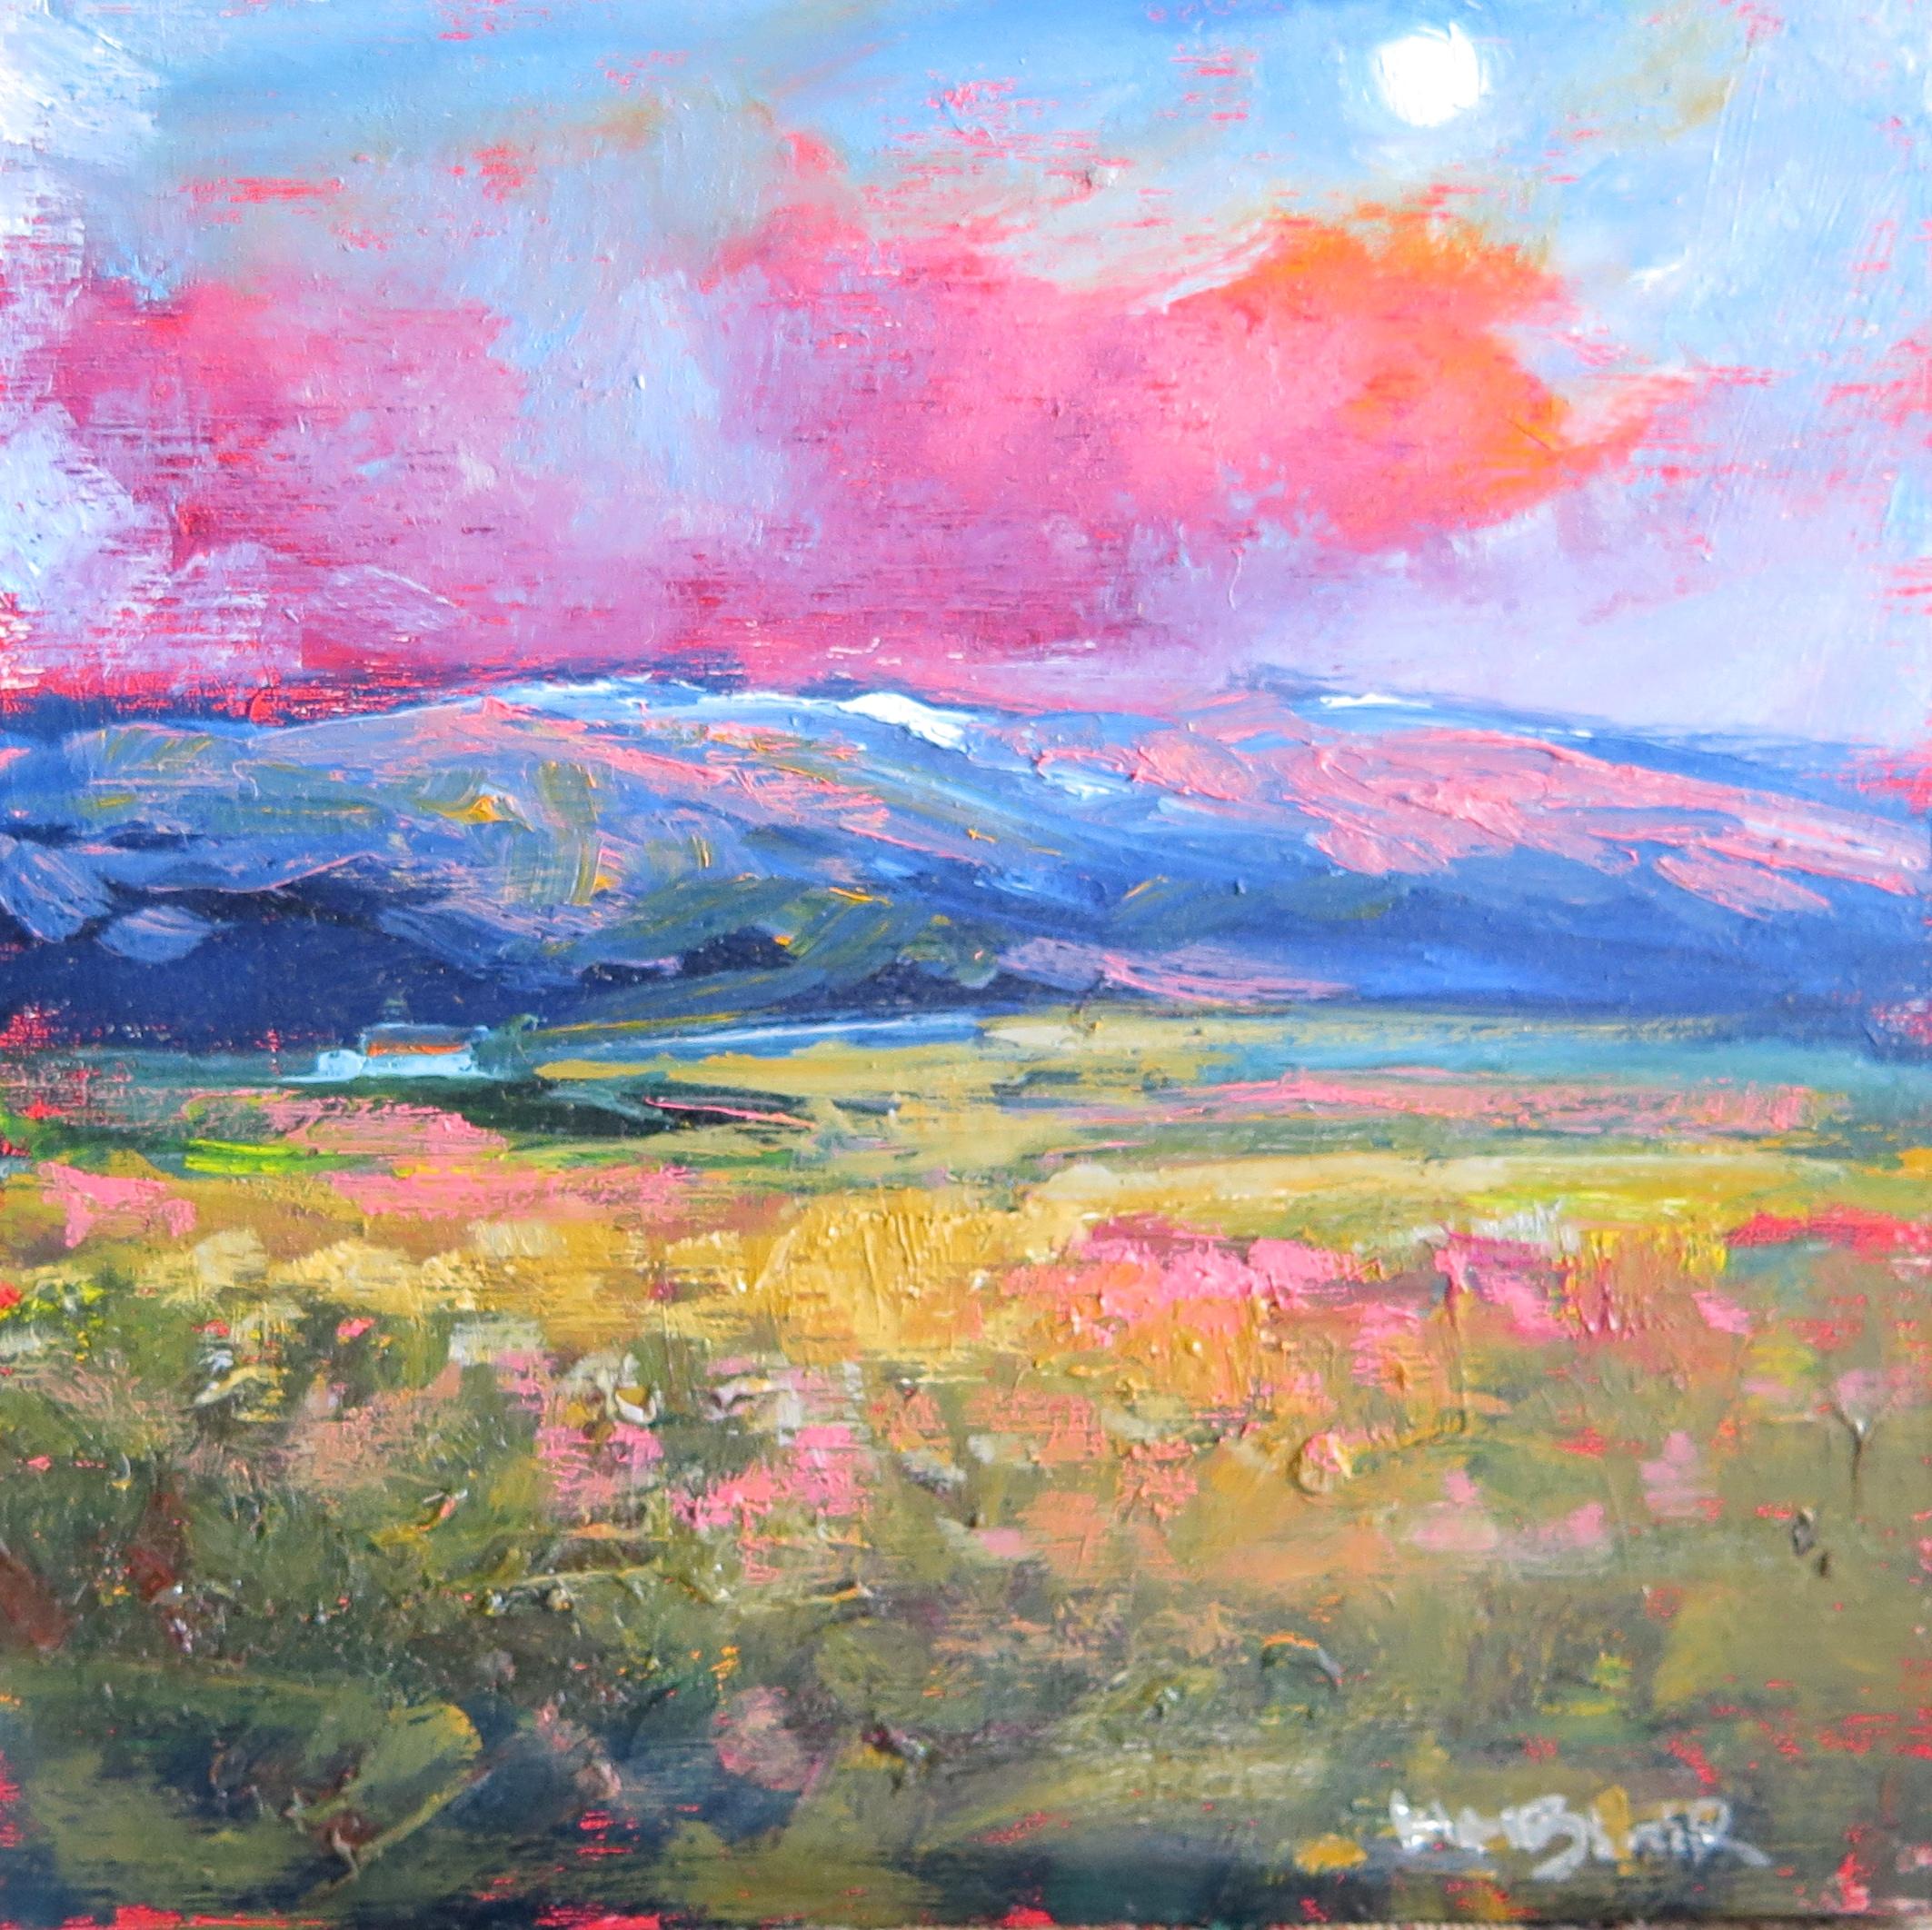 Moonlight Mountain, mini oil painting, by Helen Blair